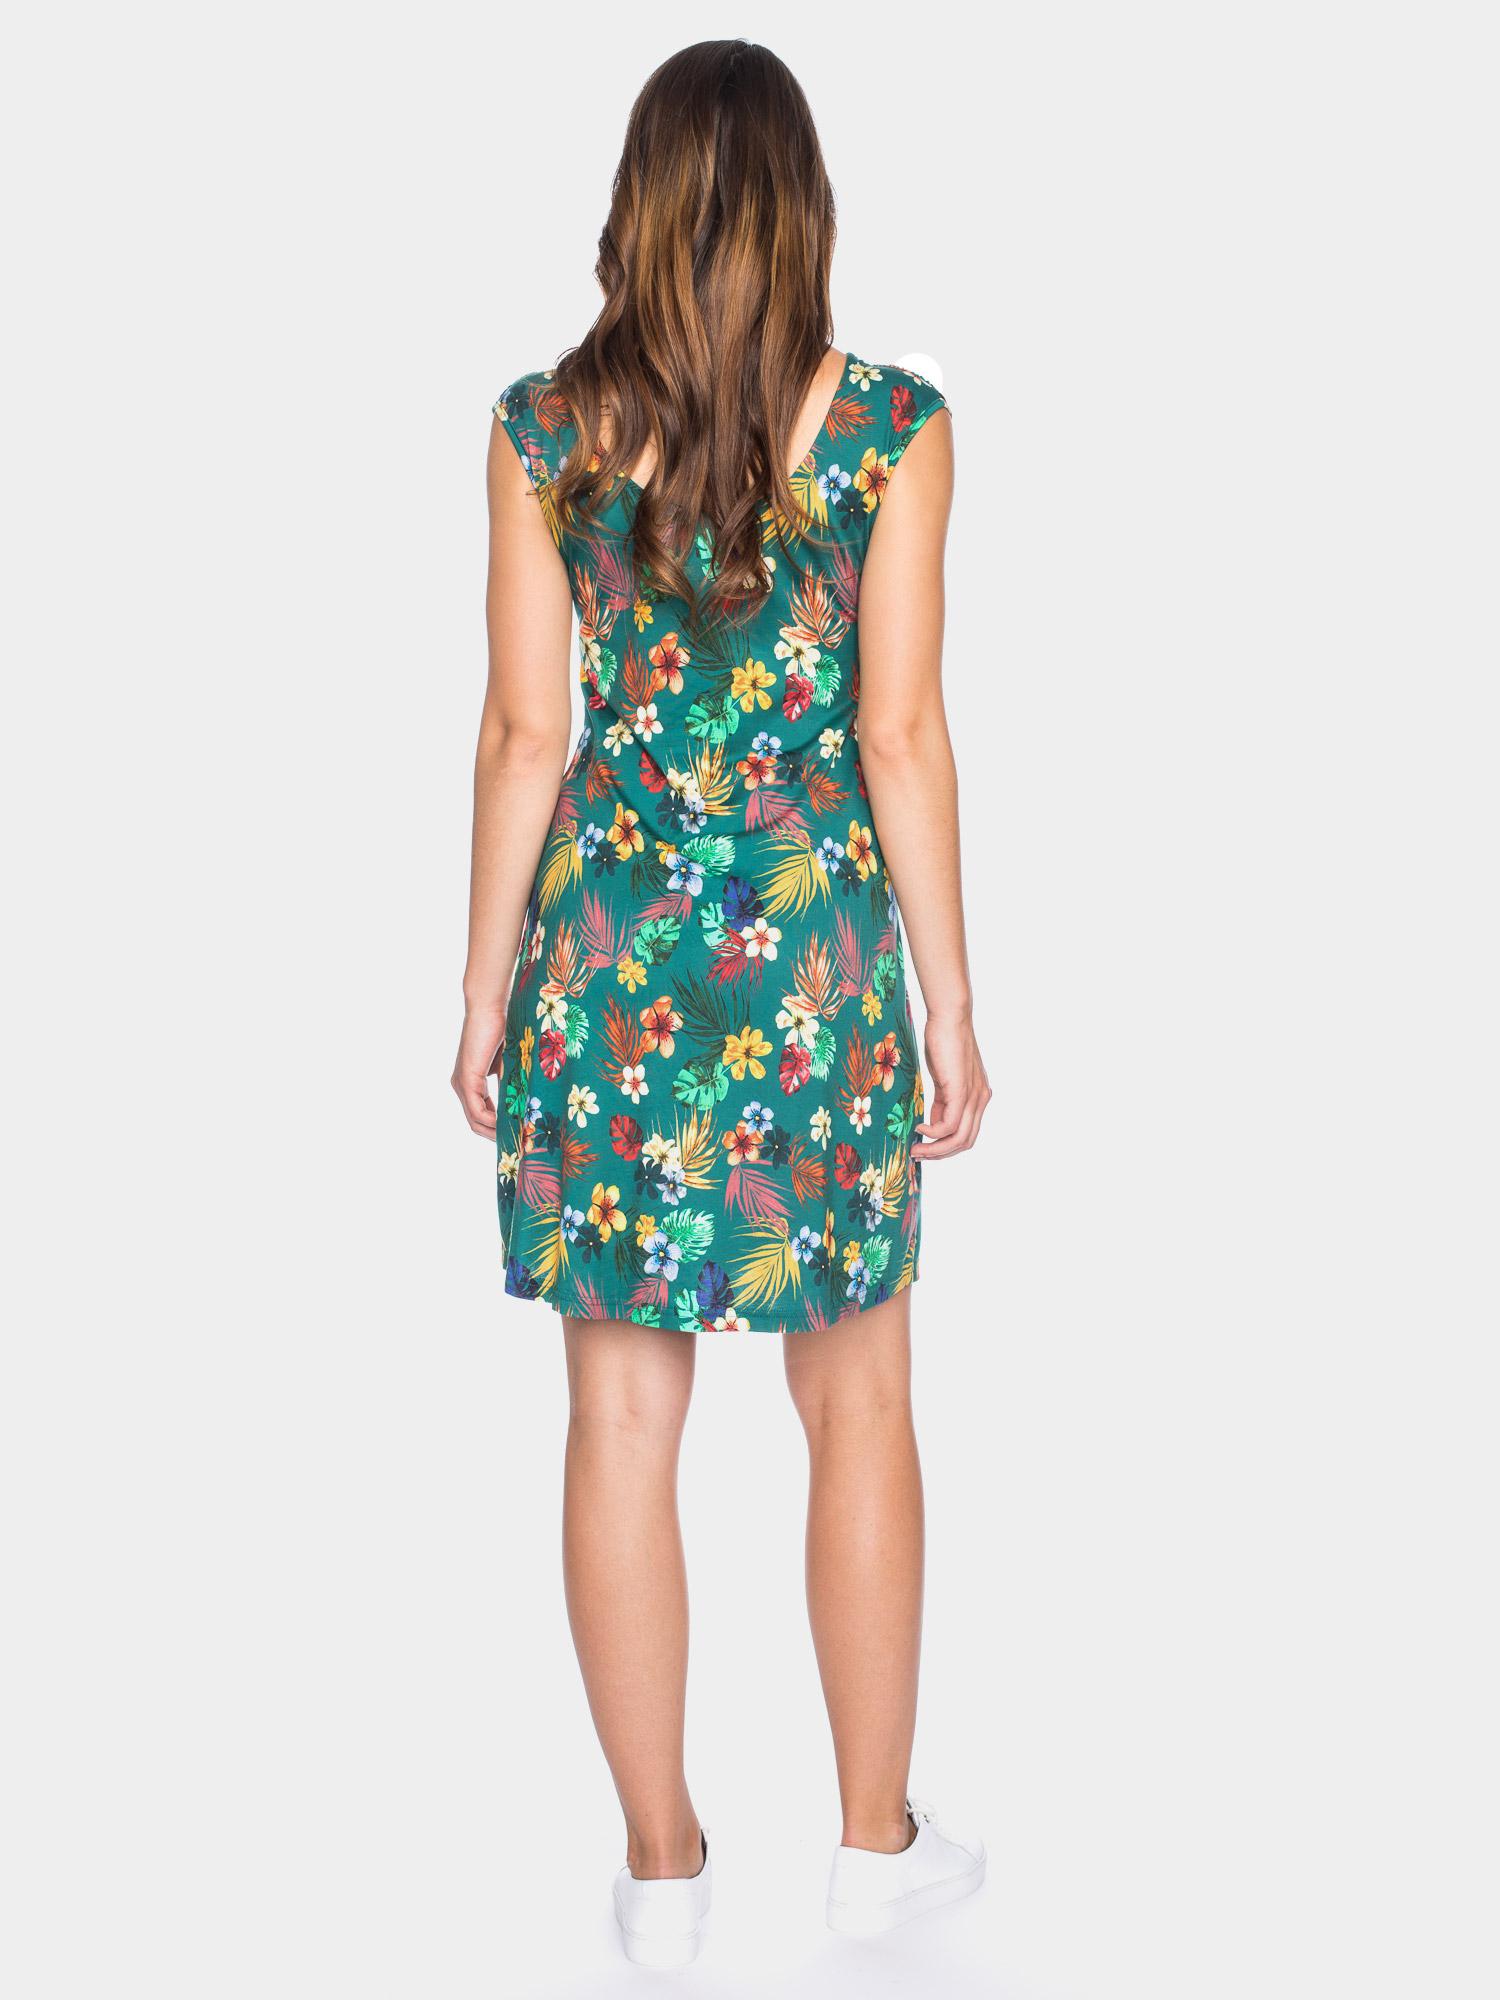 Süßes, verspieltes Sommerkleid in grün mit Tropenprint